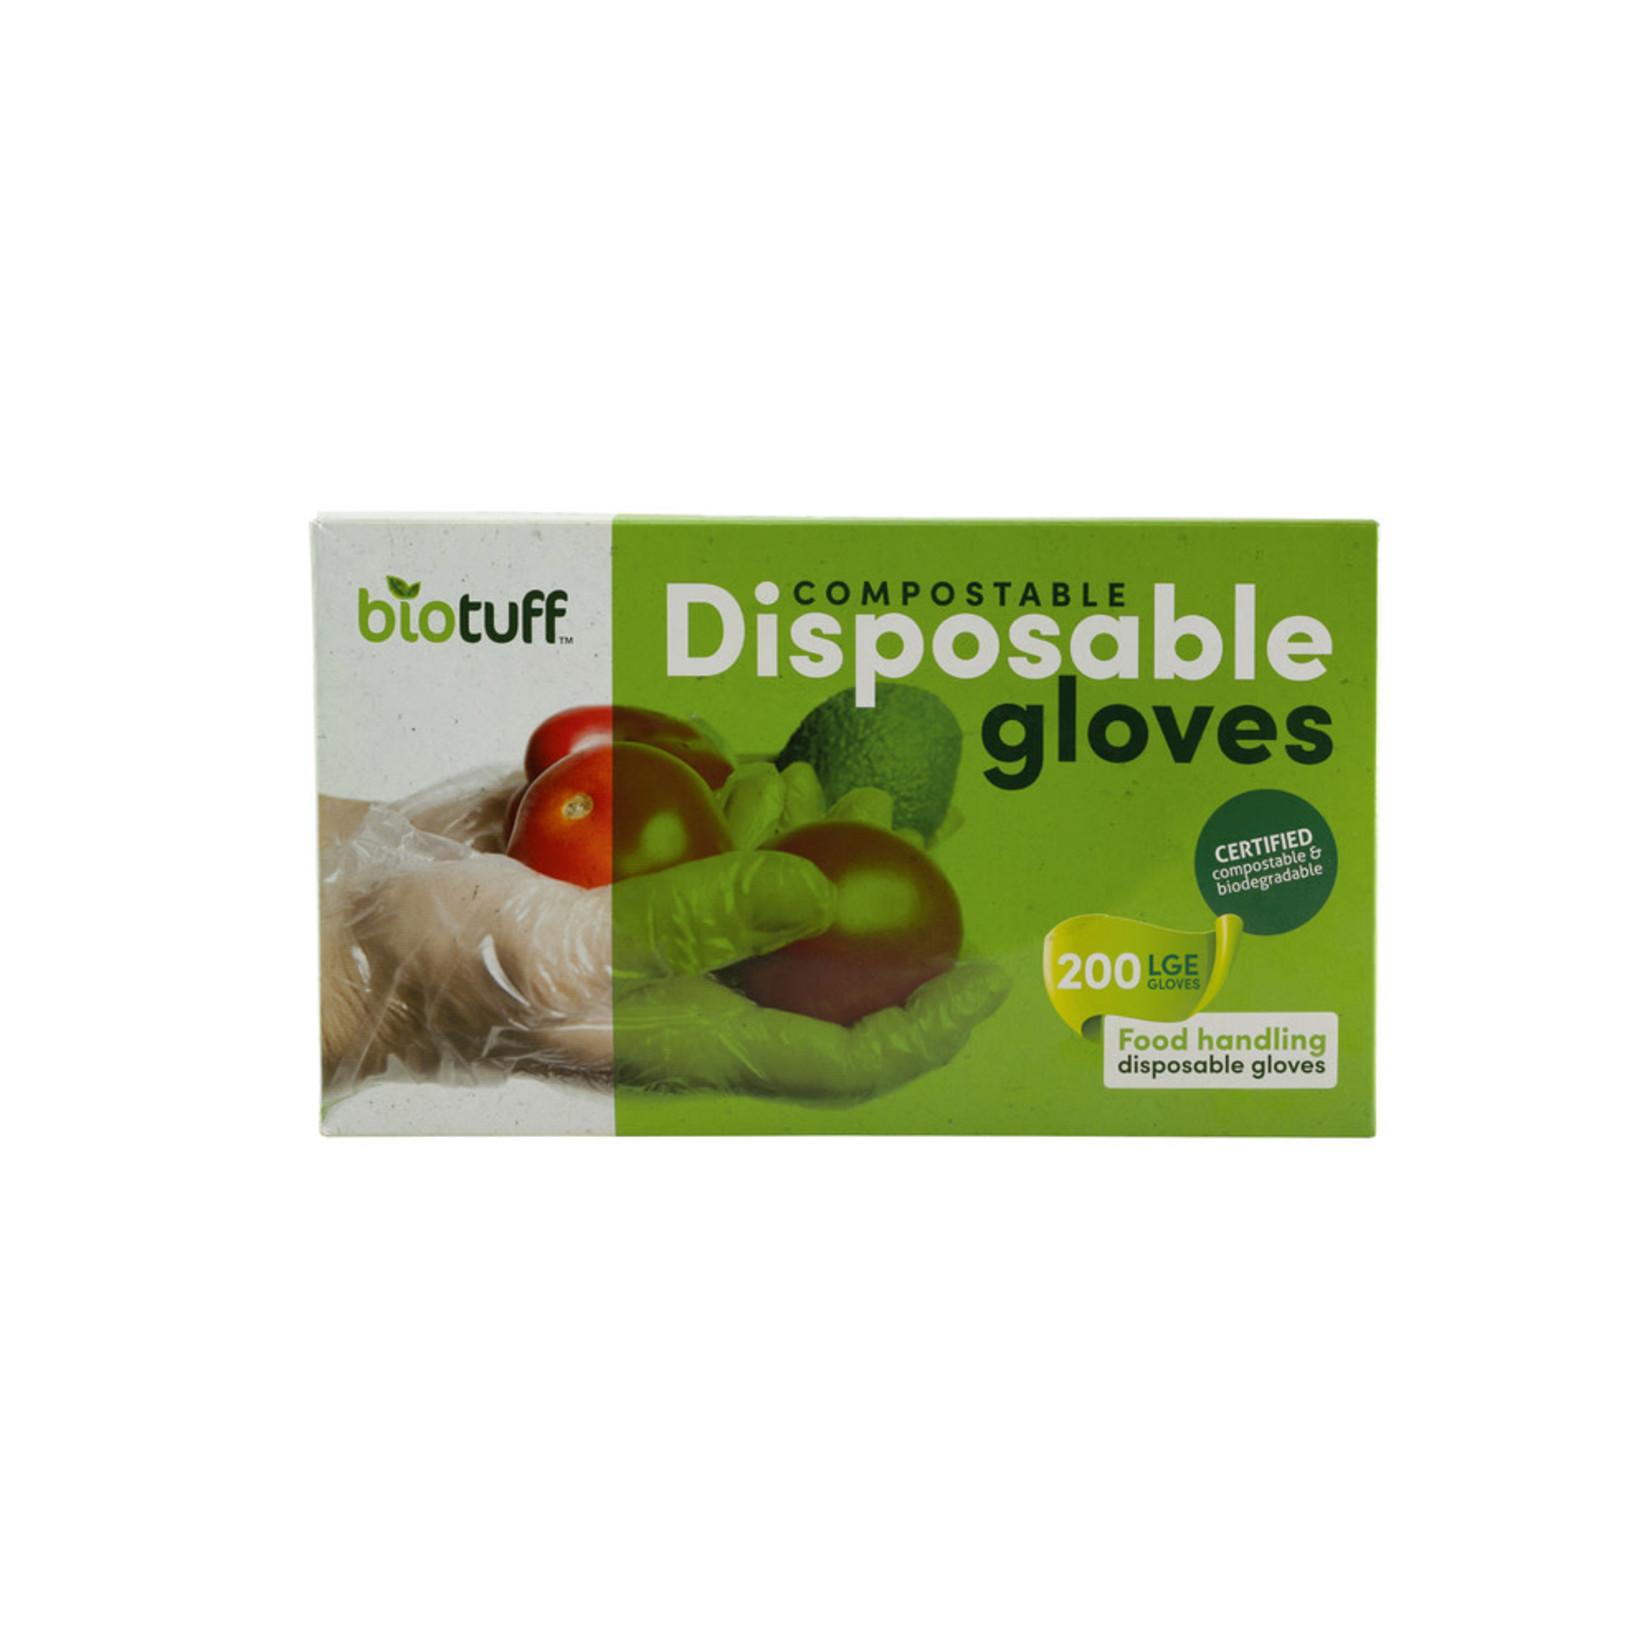 Biotuff Biotuff Compostable Disposable Gloves